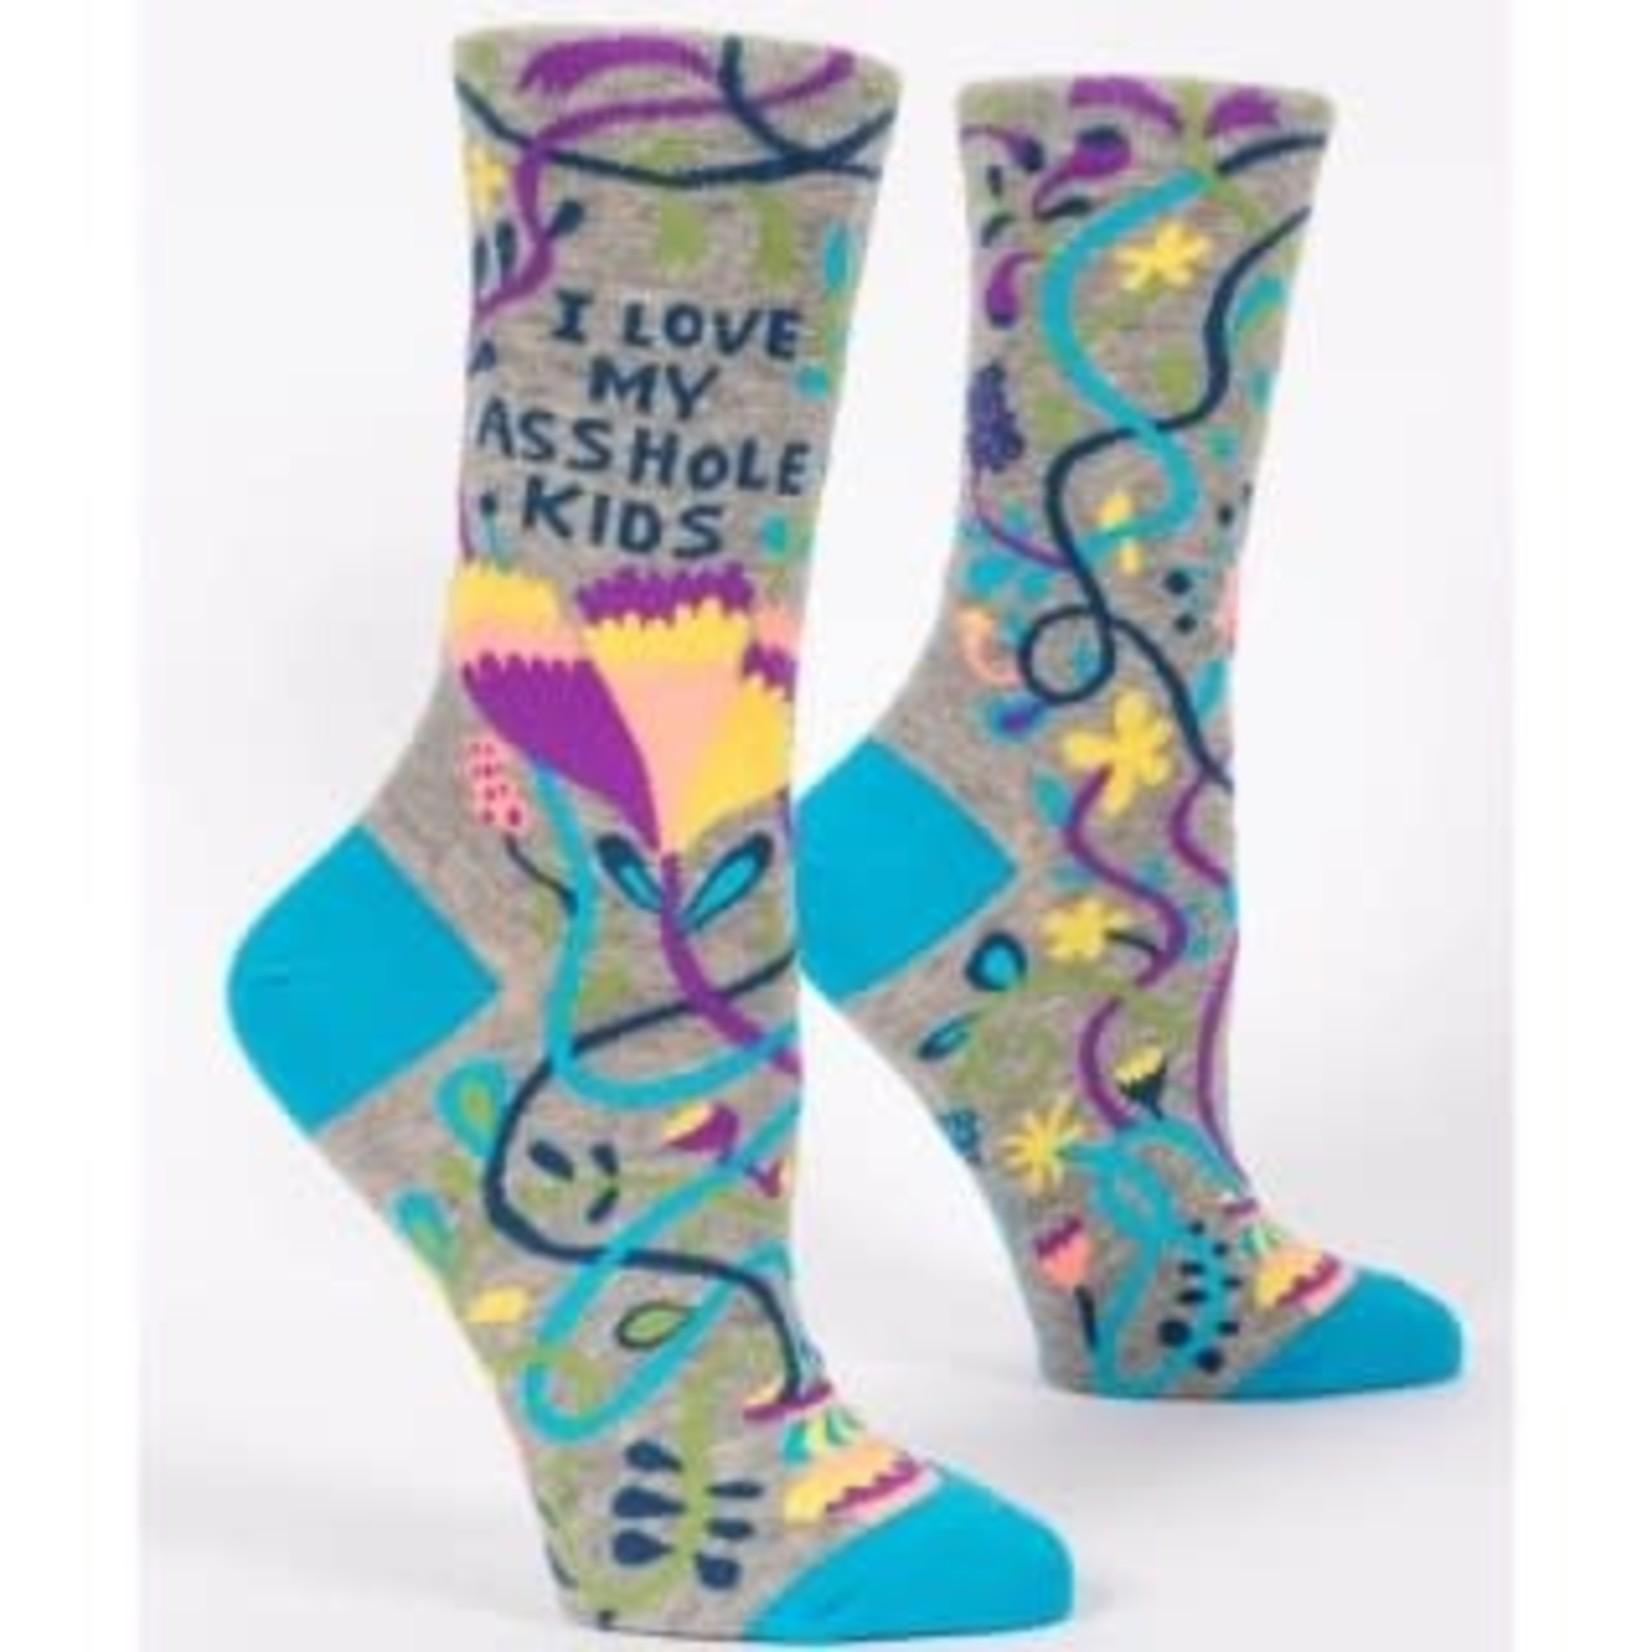 Socks (Womens) - Love My Asshole Kids